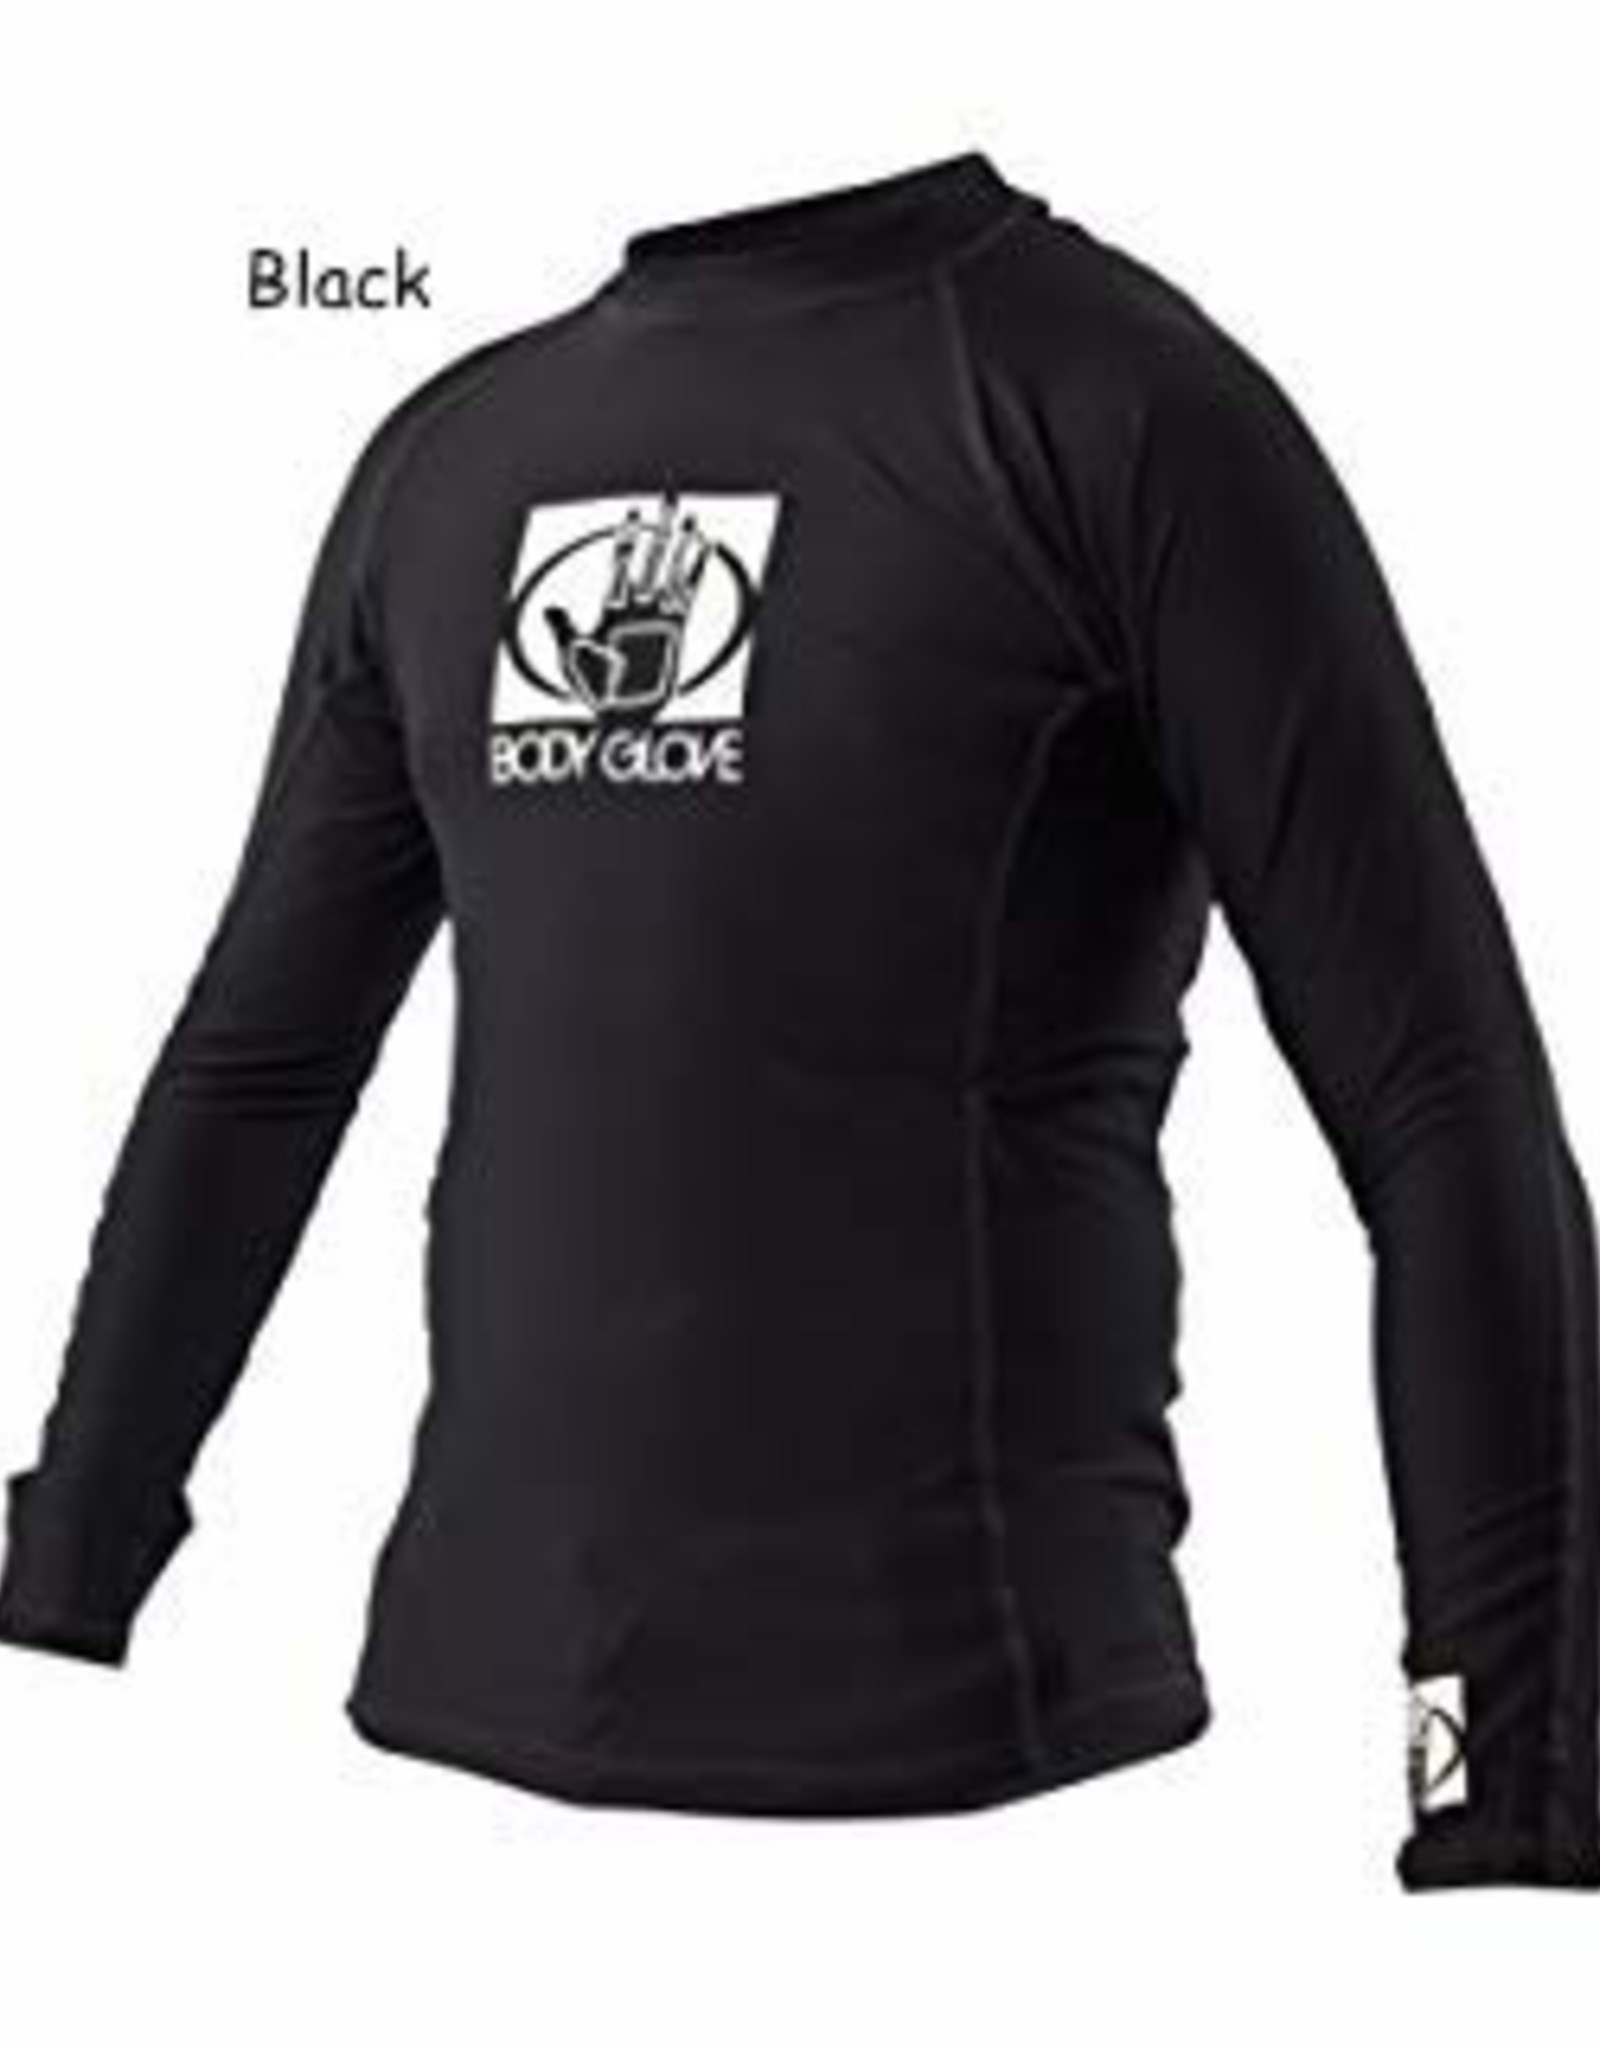 Body Glove Body Glove Men's Basic Long Sleeve Fitted Rashguard